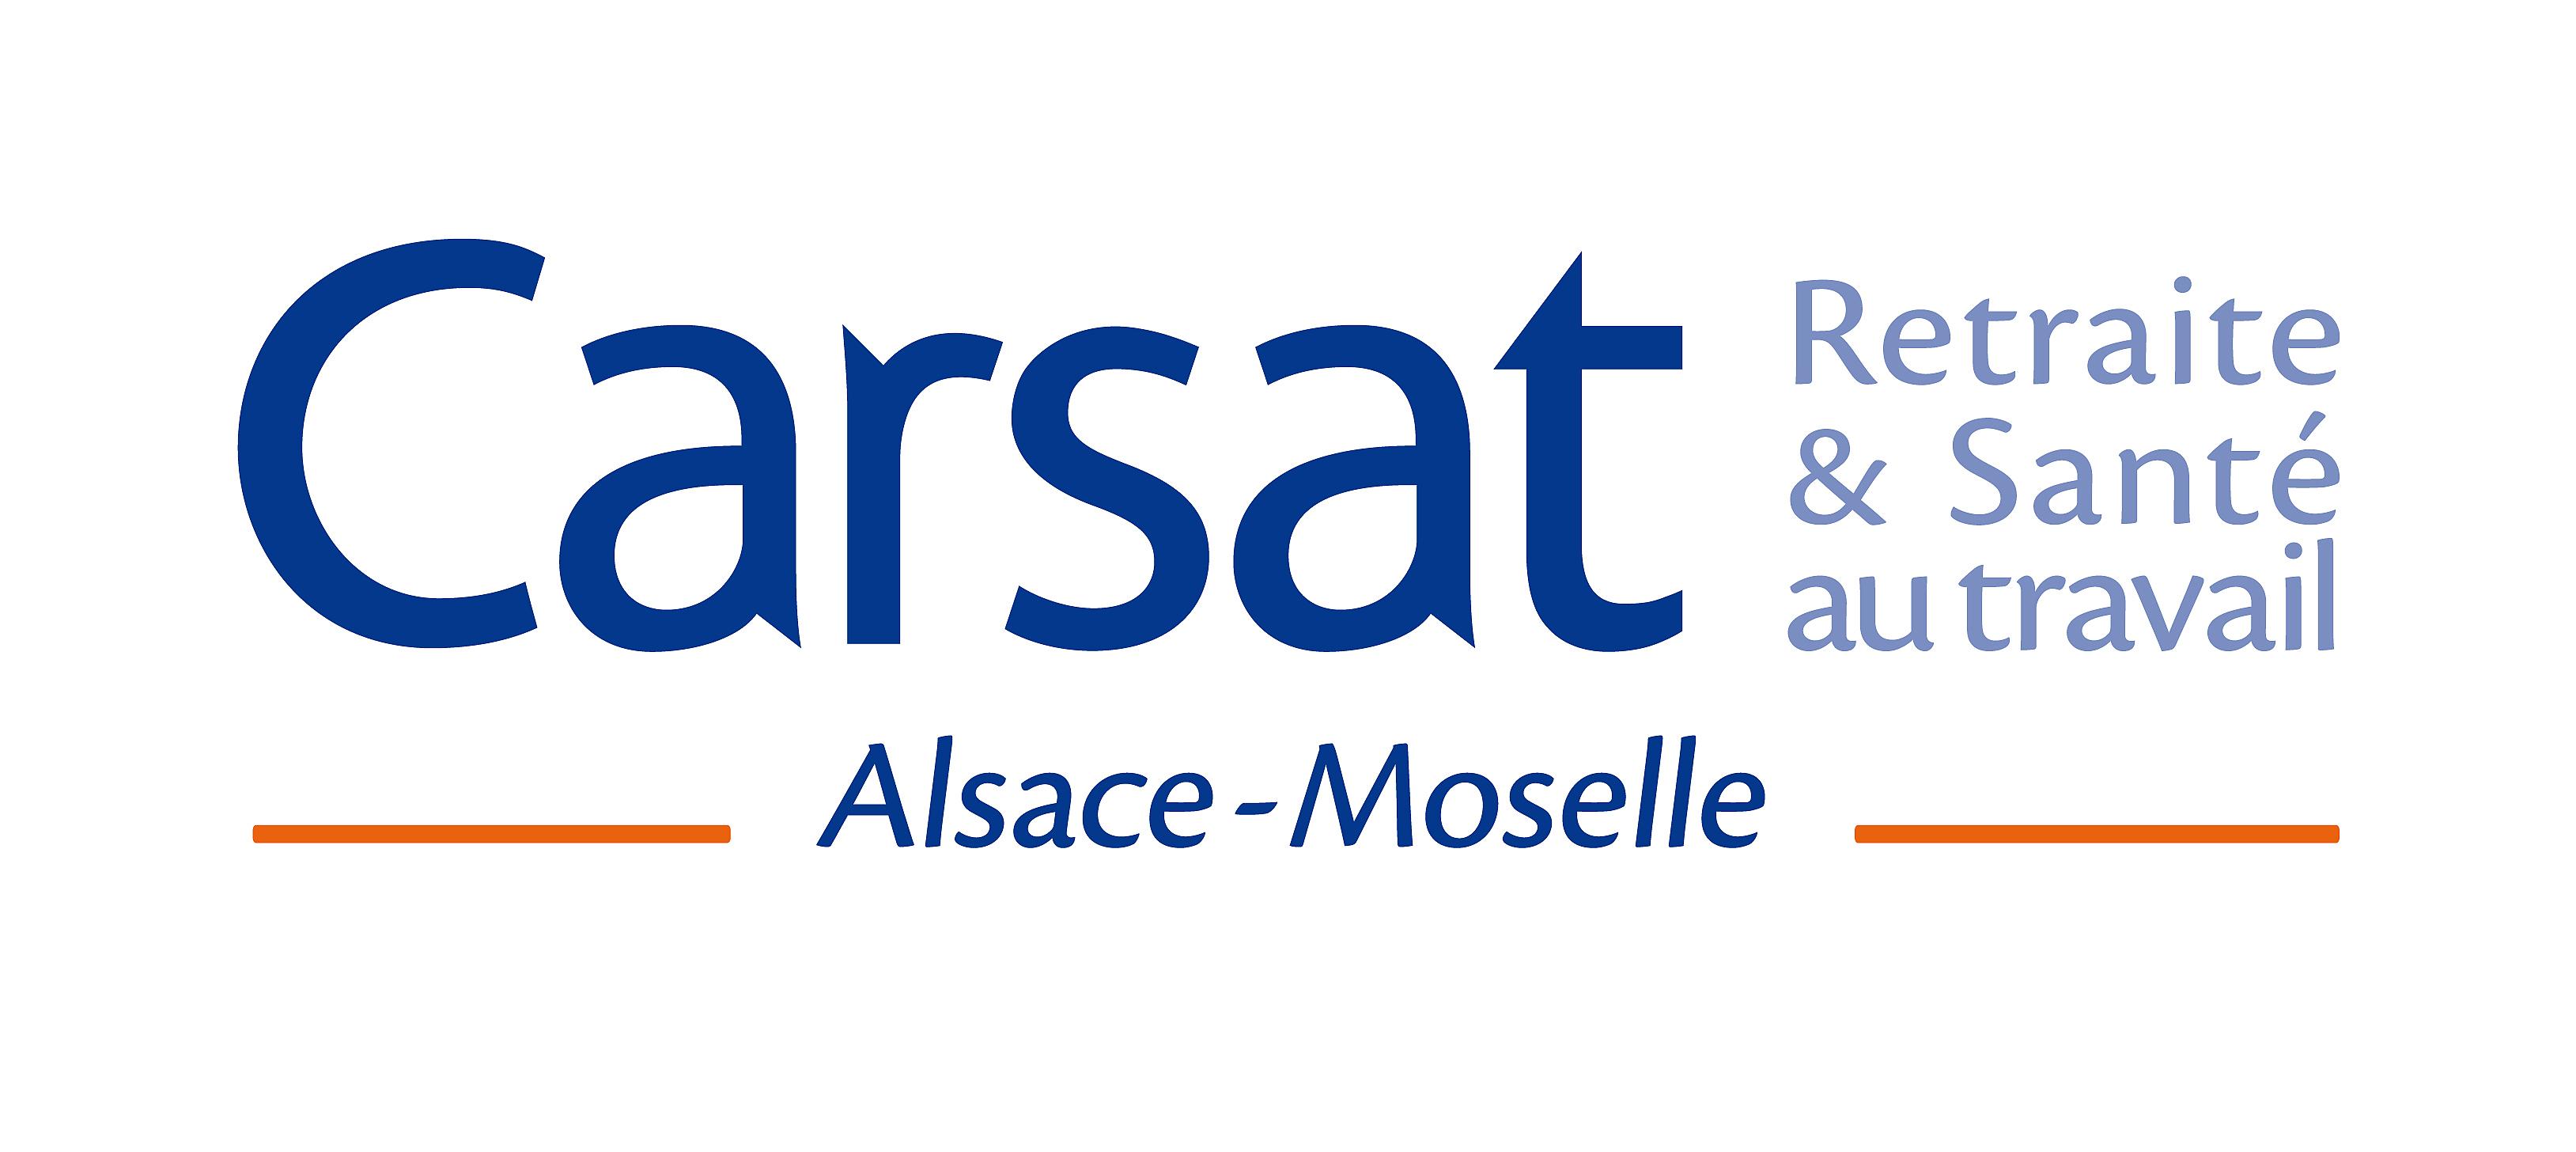 CARSAT Alsace-Moselle